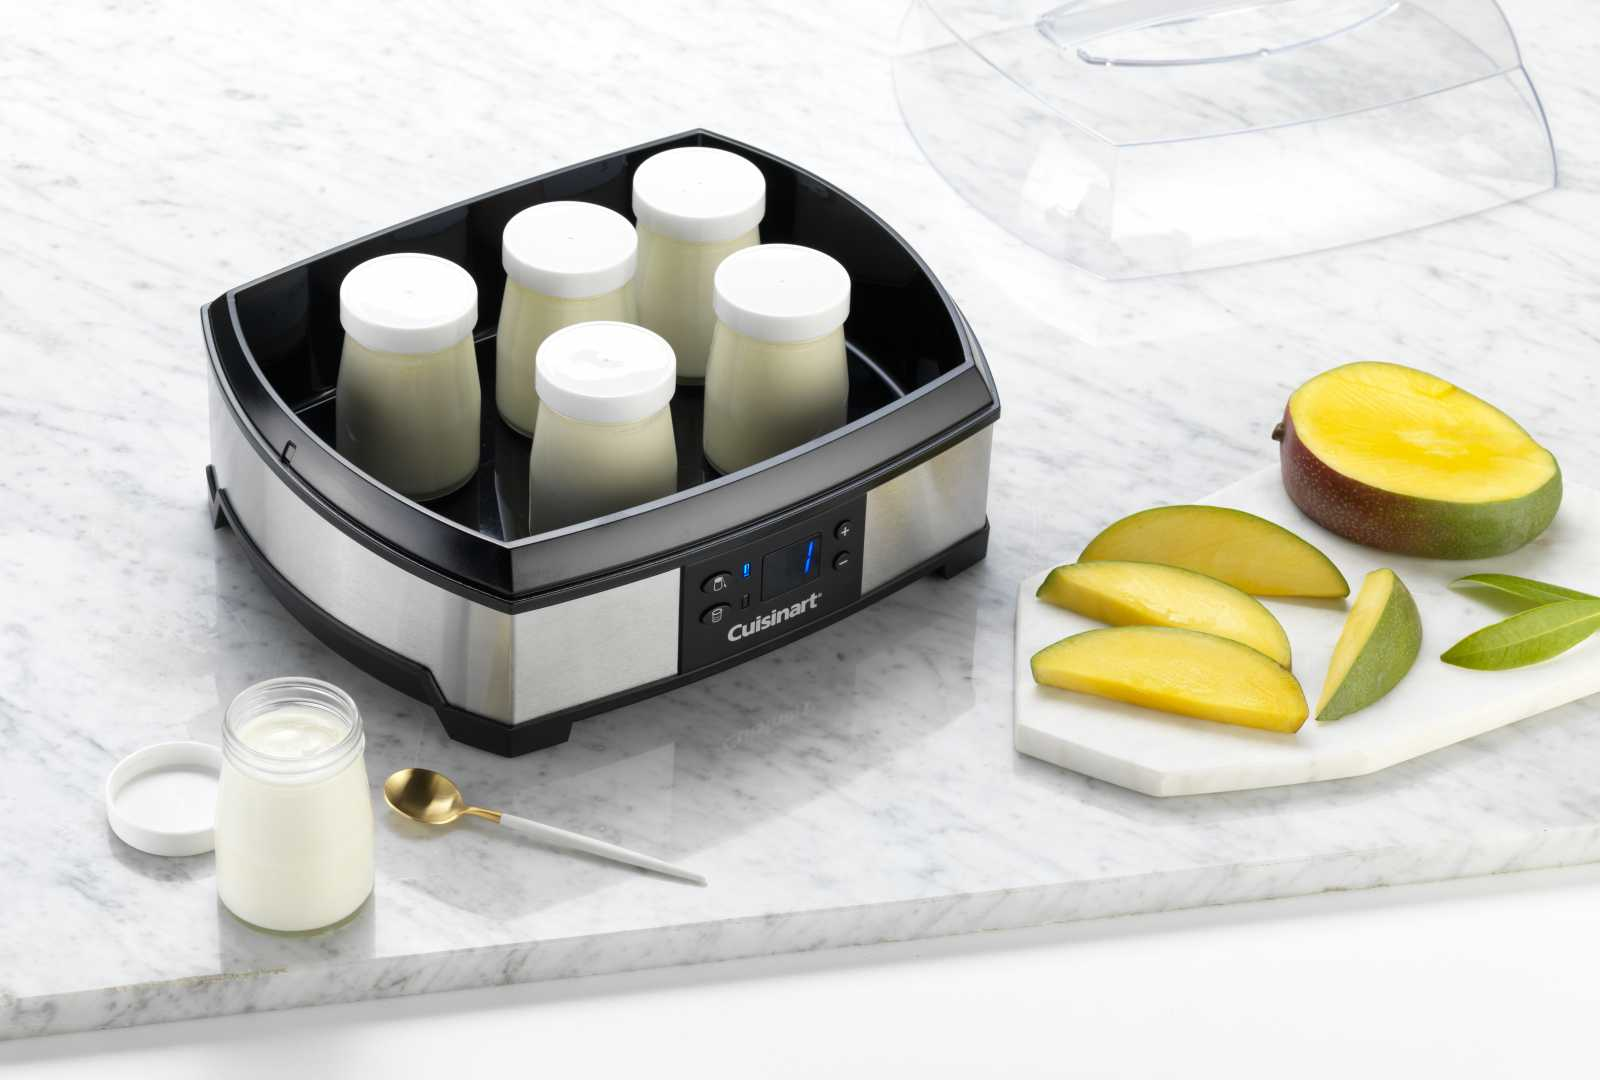 Йогуртница-творожница Cuisinart, 30х14,5х23 см Cuisinart YM400E фото 2